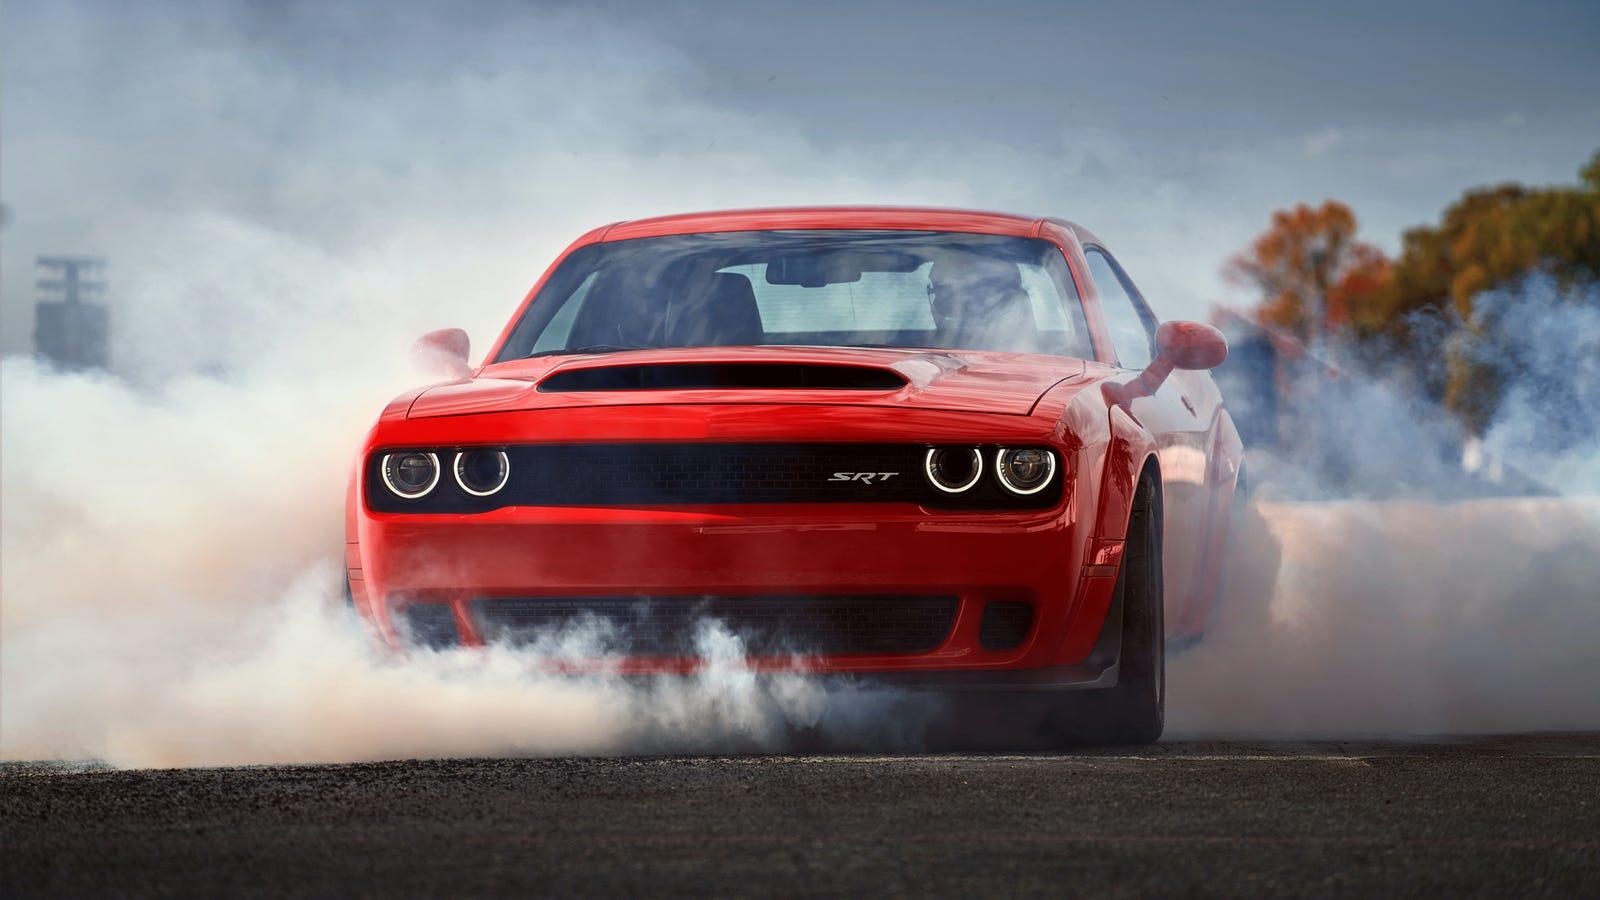 The 840 Horsepower Dodge Challenger Demon Starts At $84,995